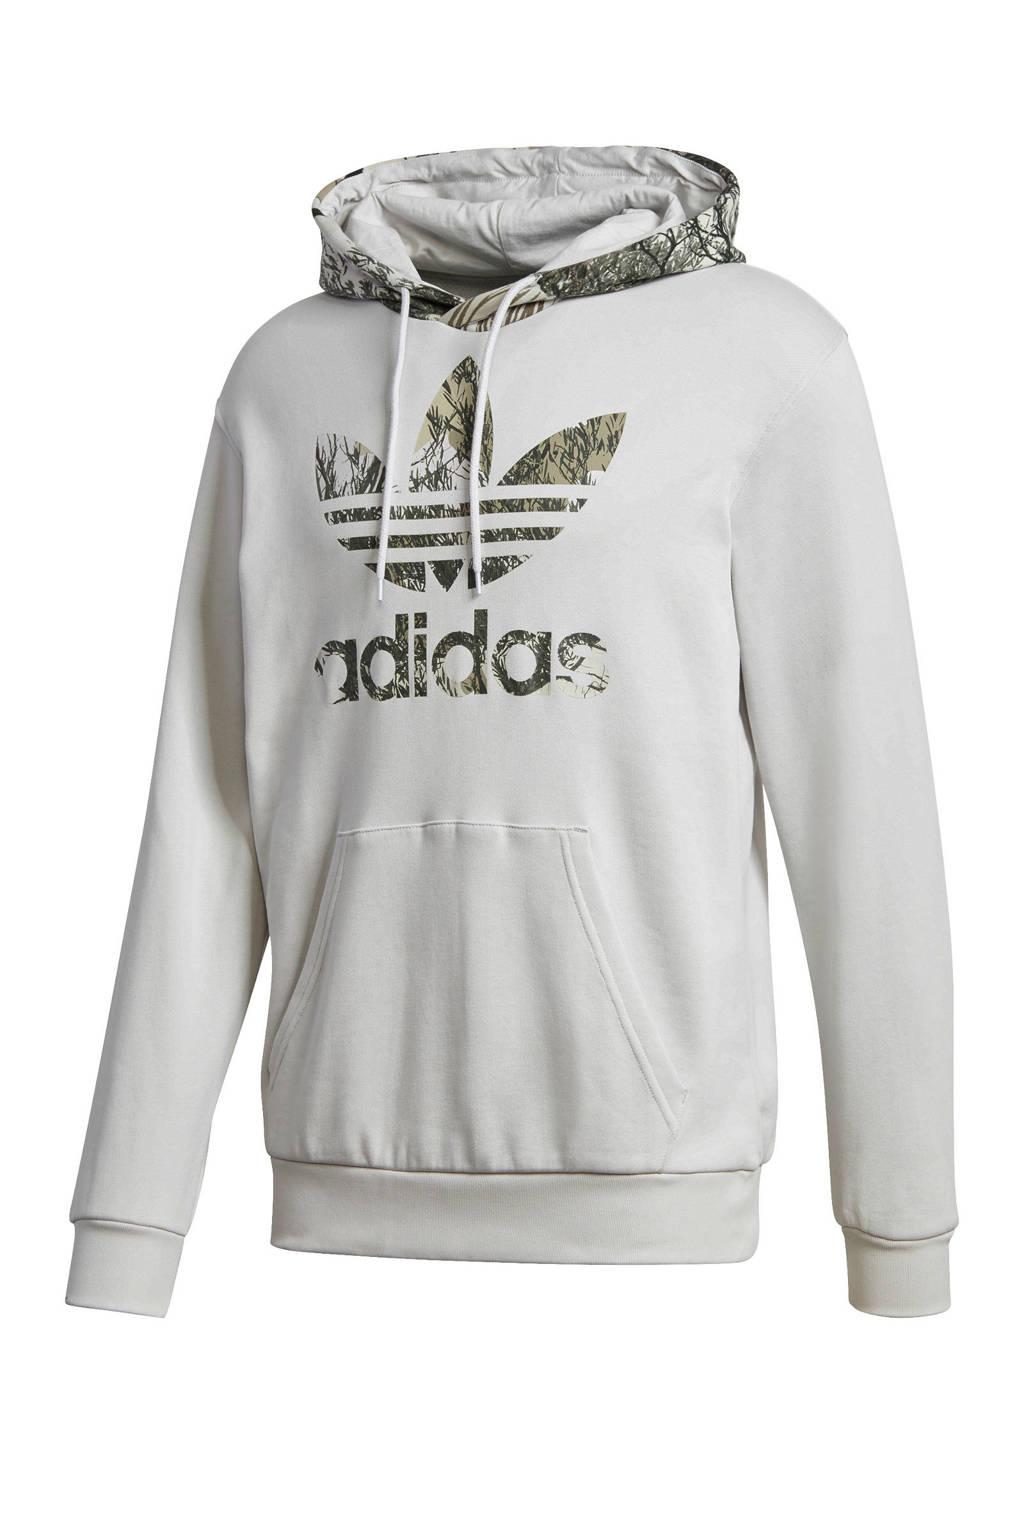 adidas Originals hoodie grijs, Grijs